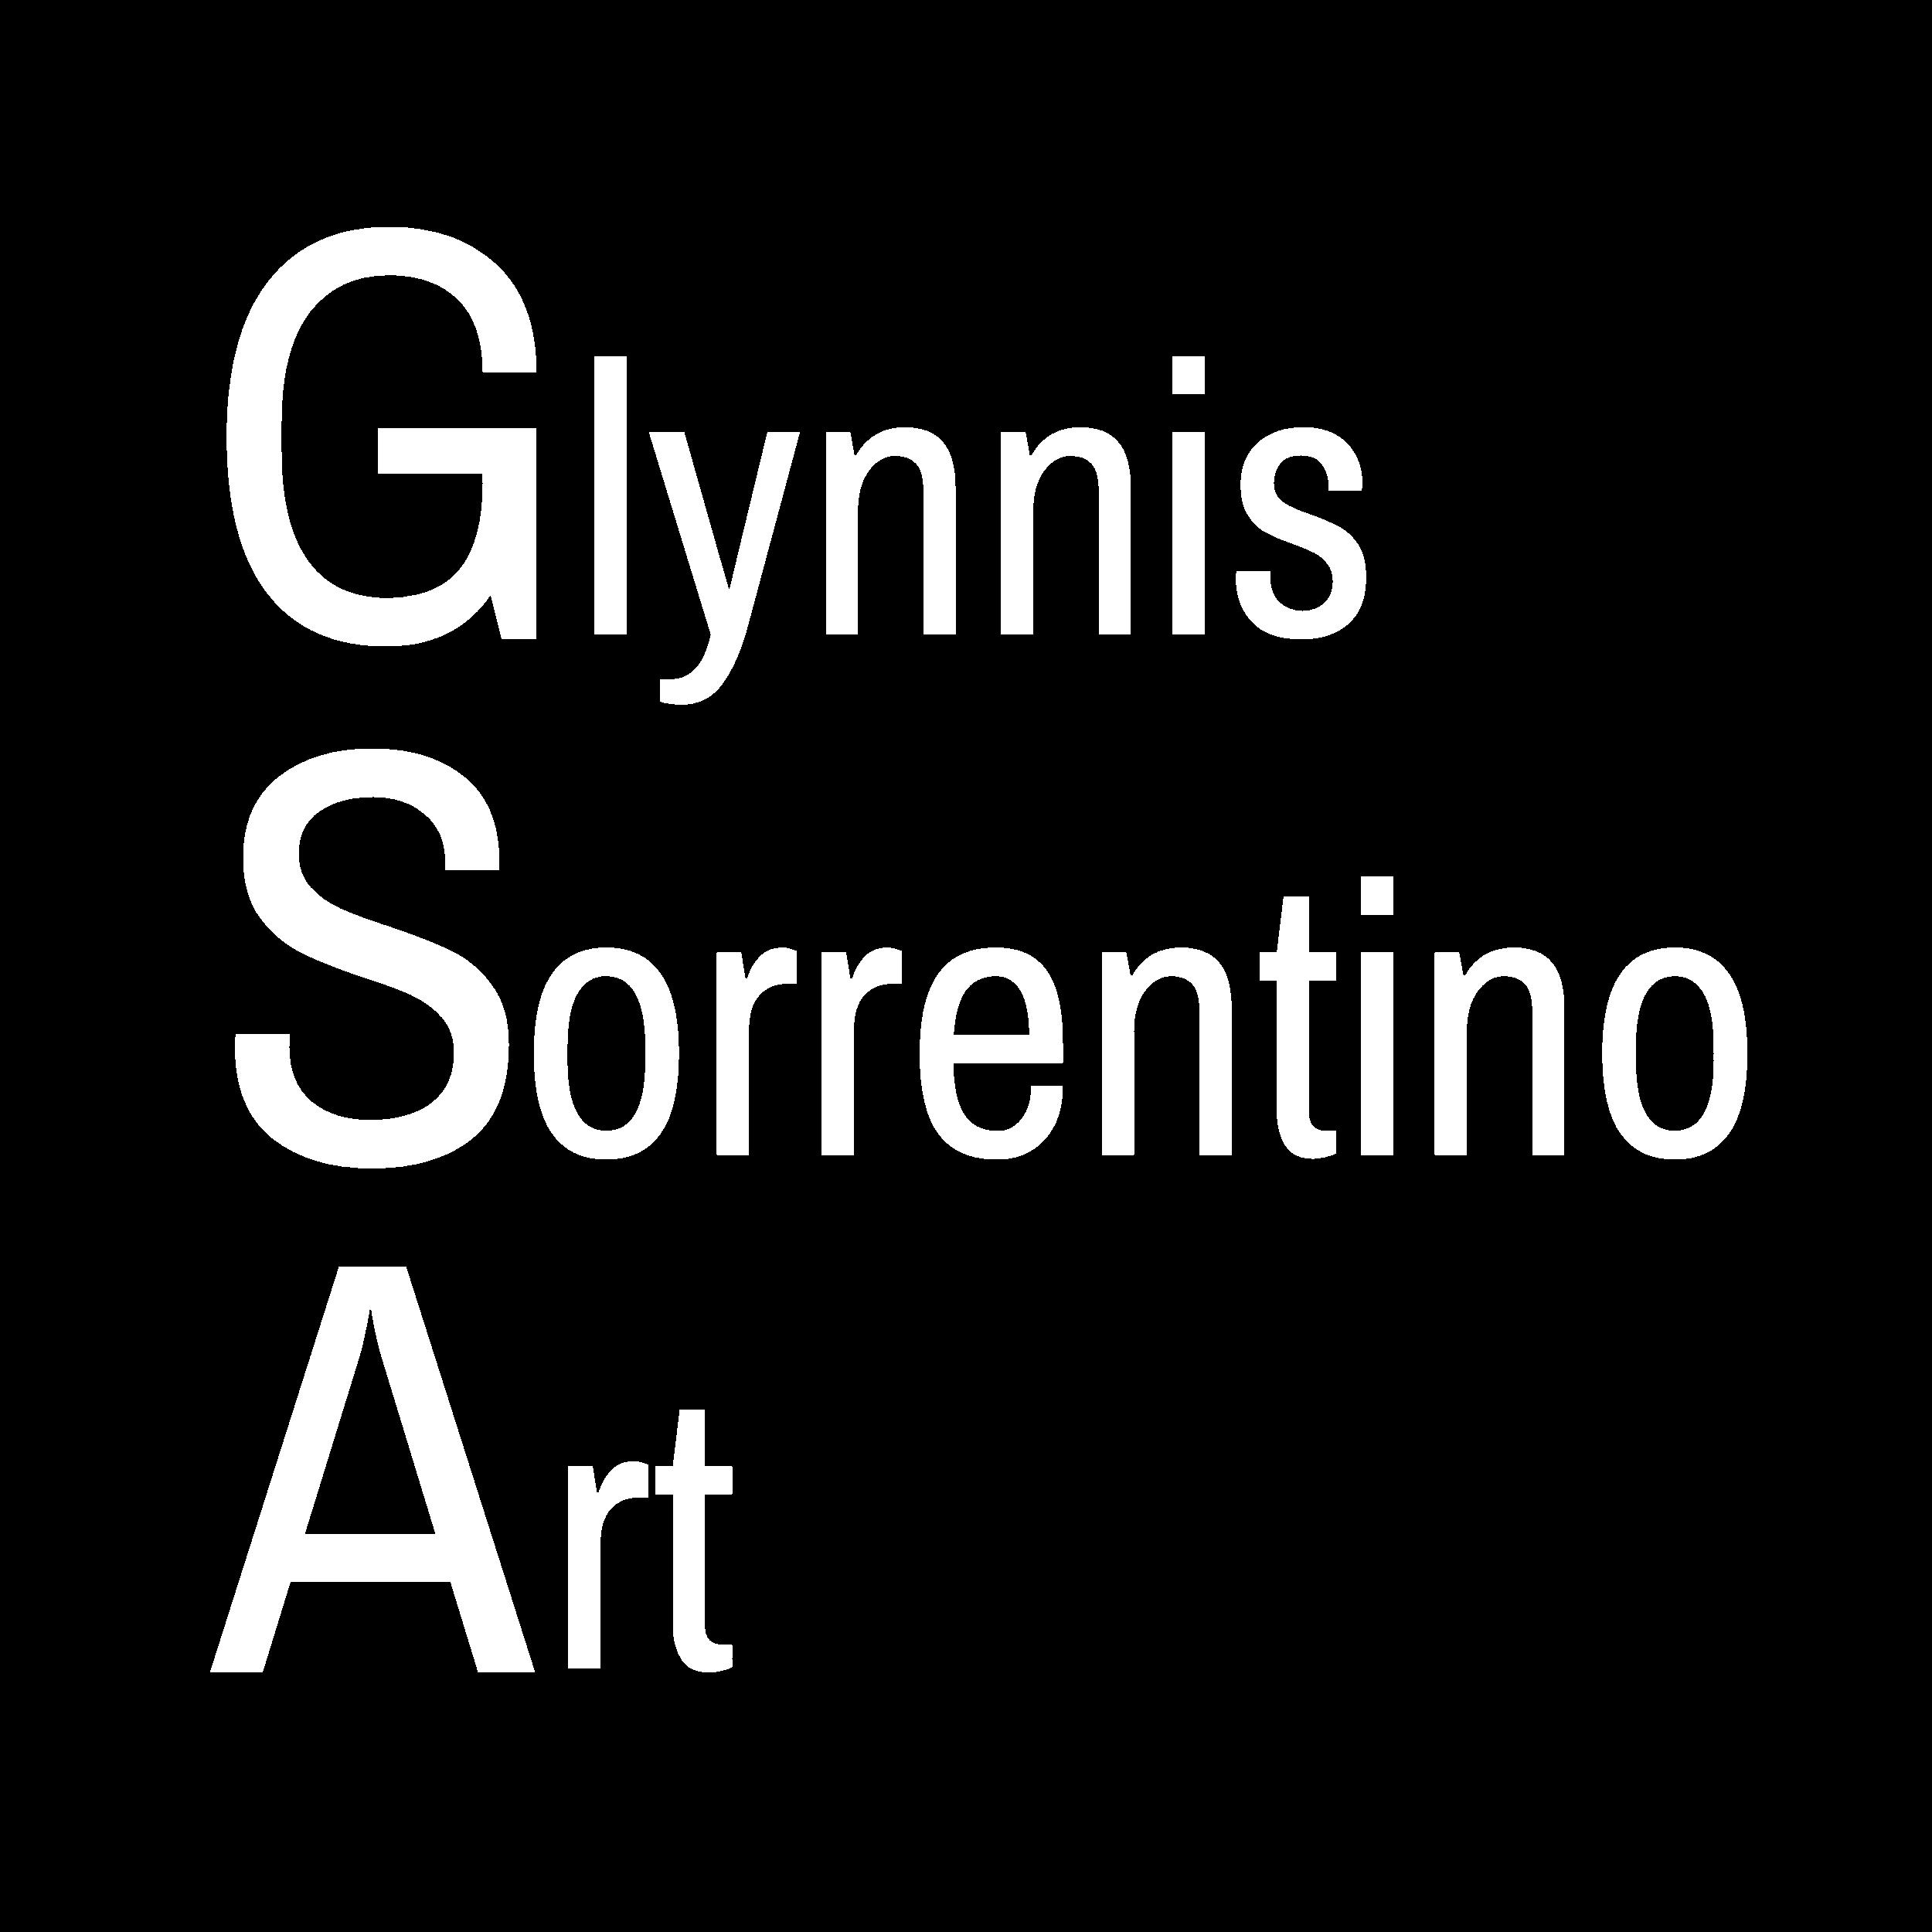 Glynnis Sorrentino Art